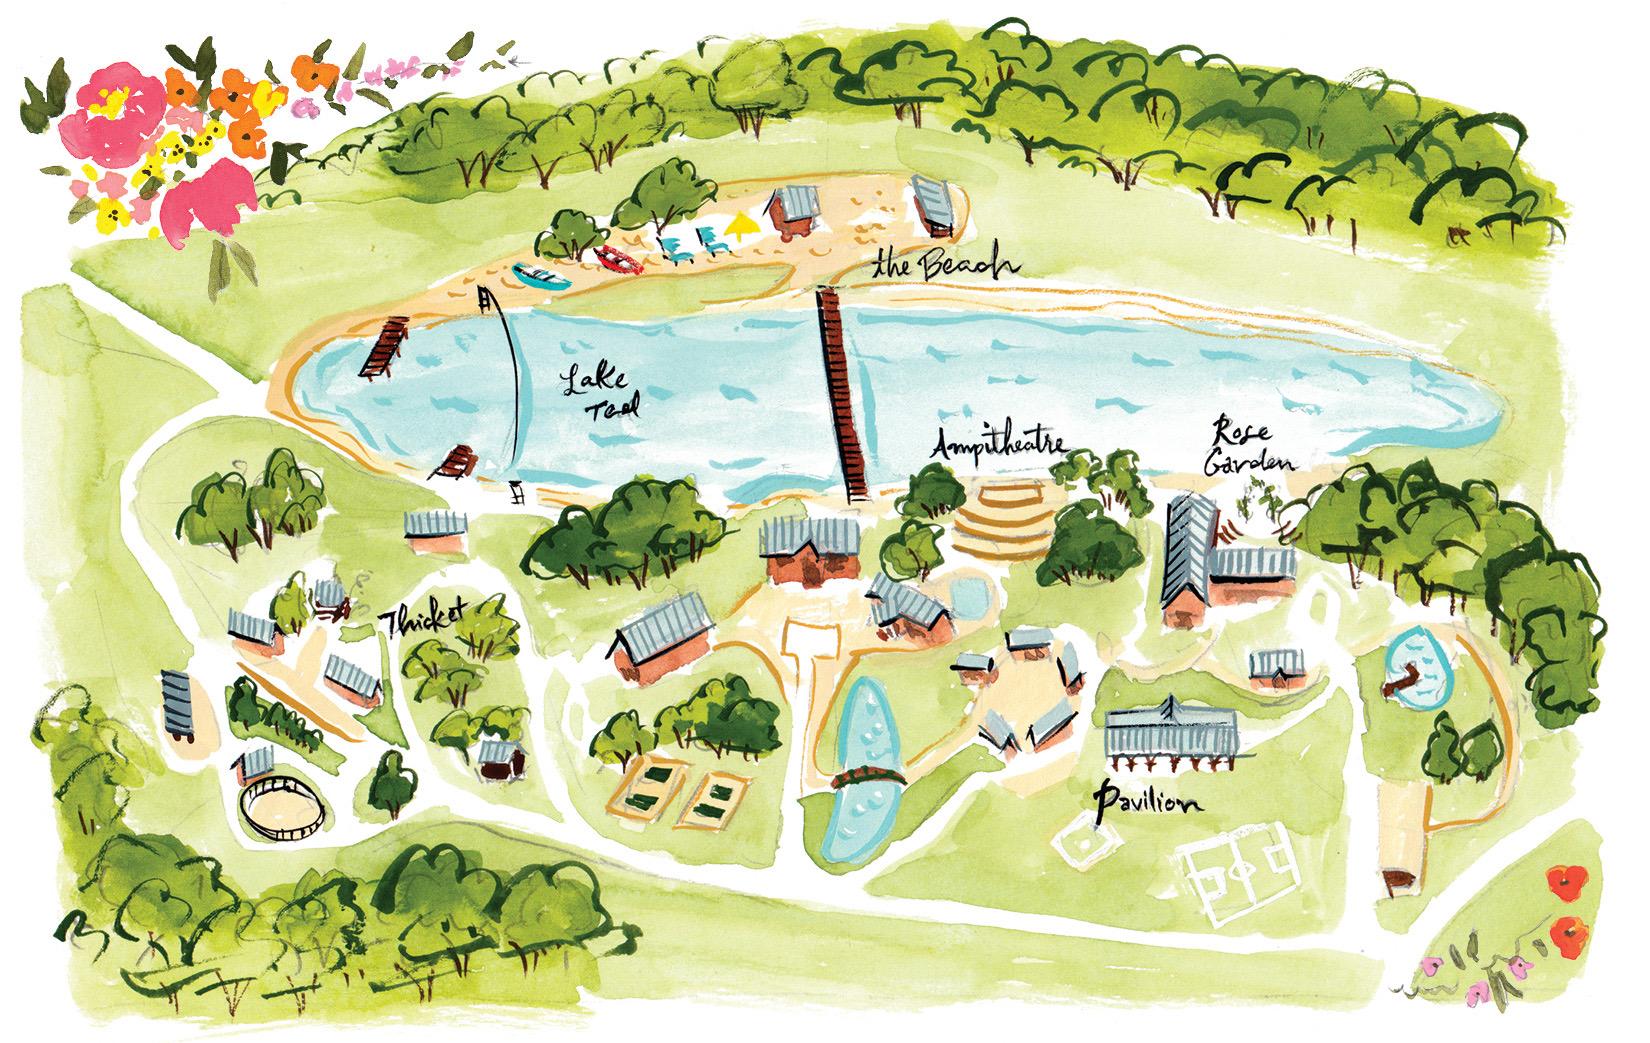 texas-camp-map-jolly-edition